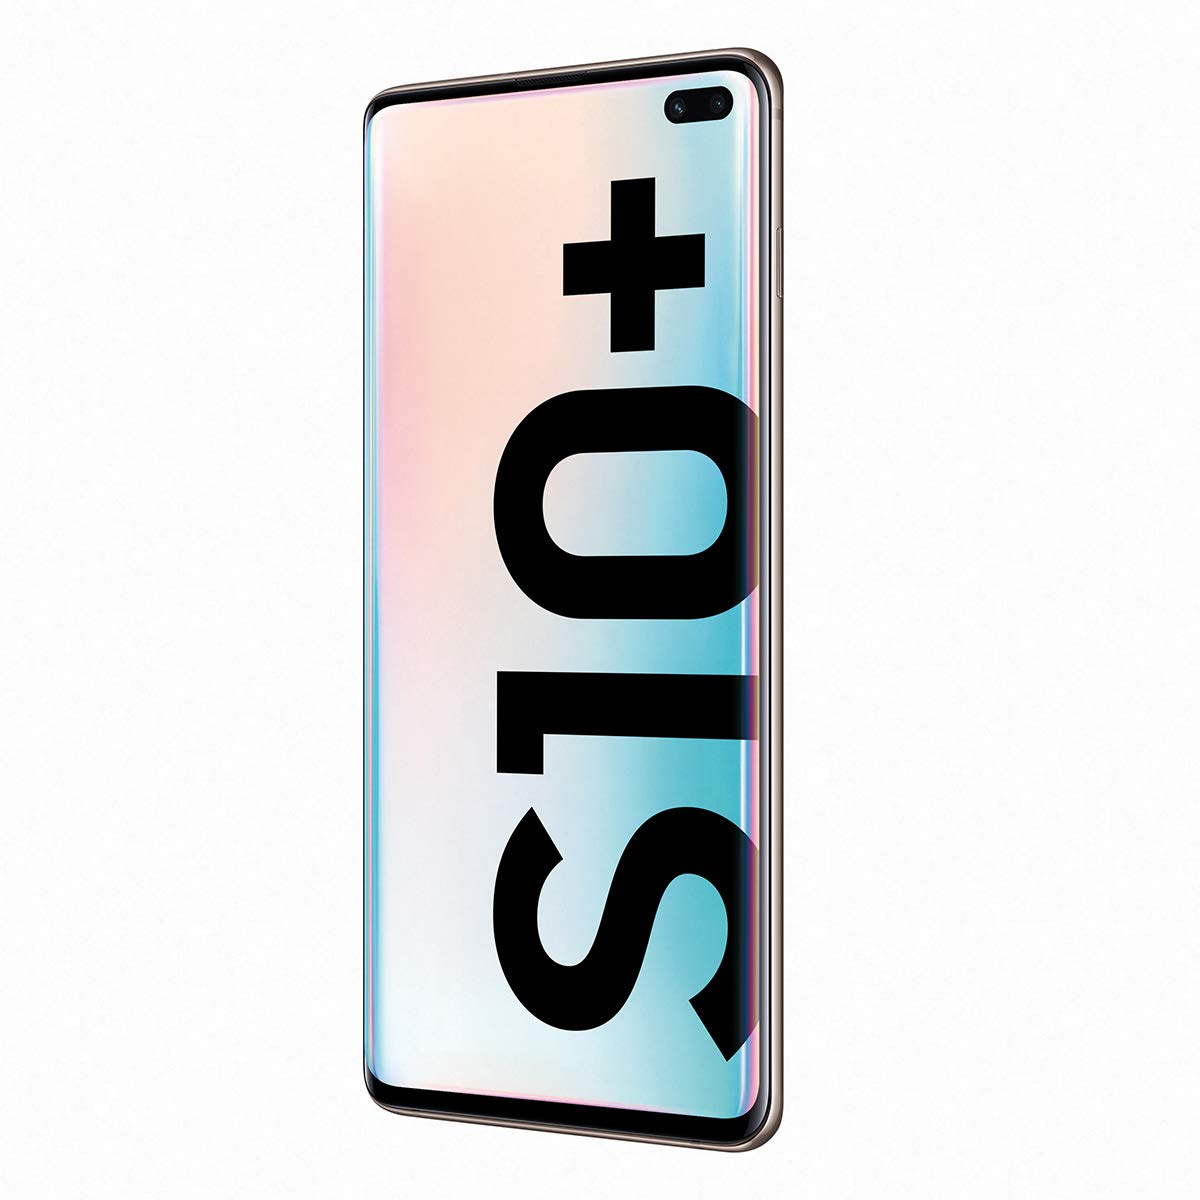 Samsung Galaxy S10 +, Band LTE/WiFi, Dual SIM, Schwarz Farbe (Schwarz), 12 8GB Memoria Interna, 8GB RAM, Bildschirm D